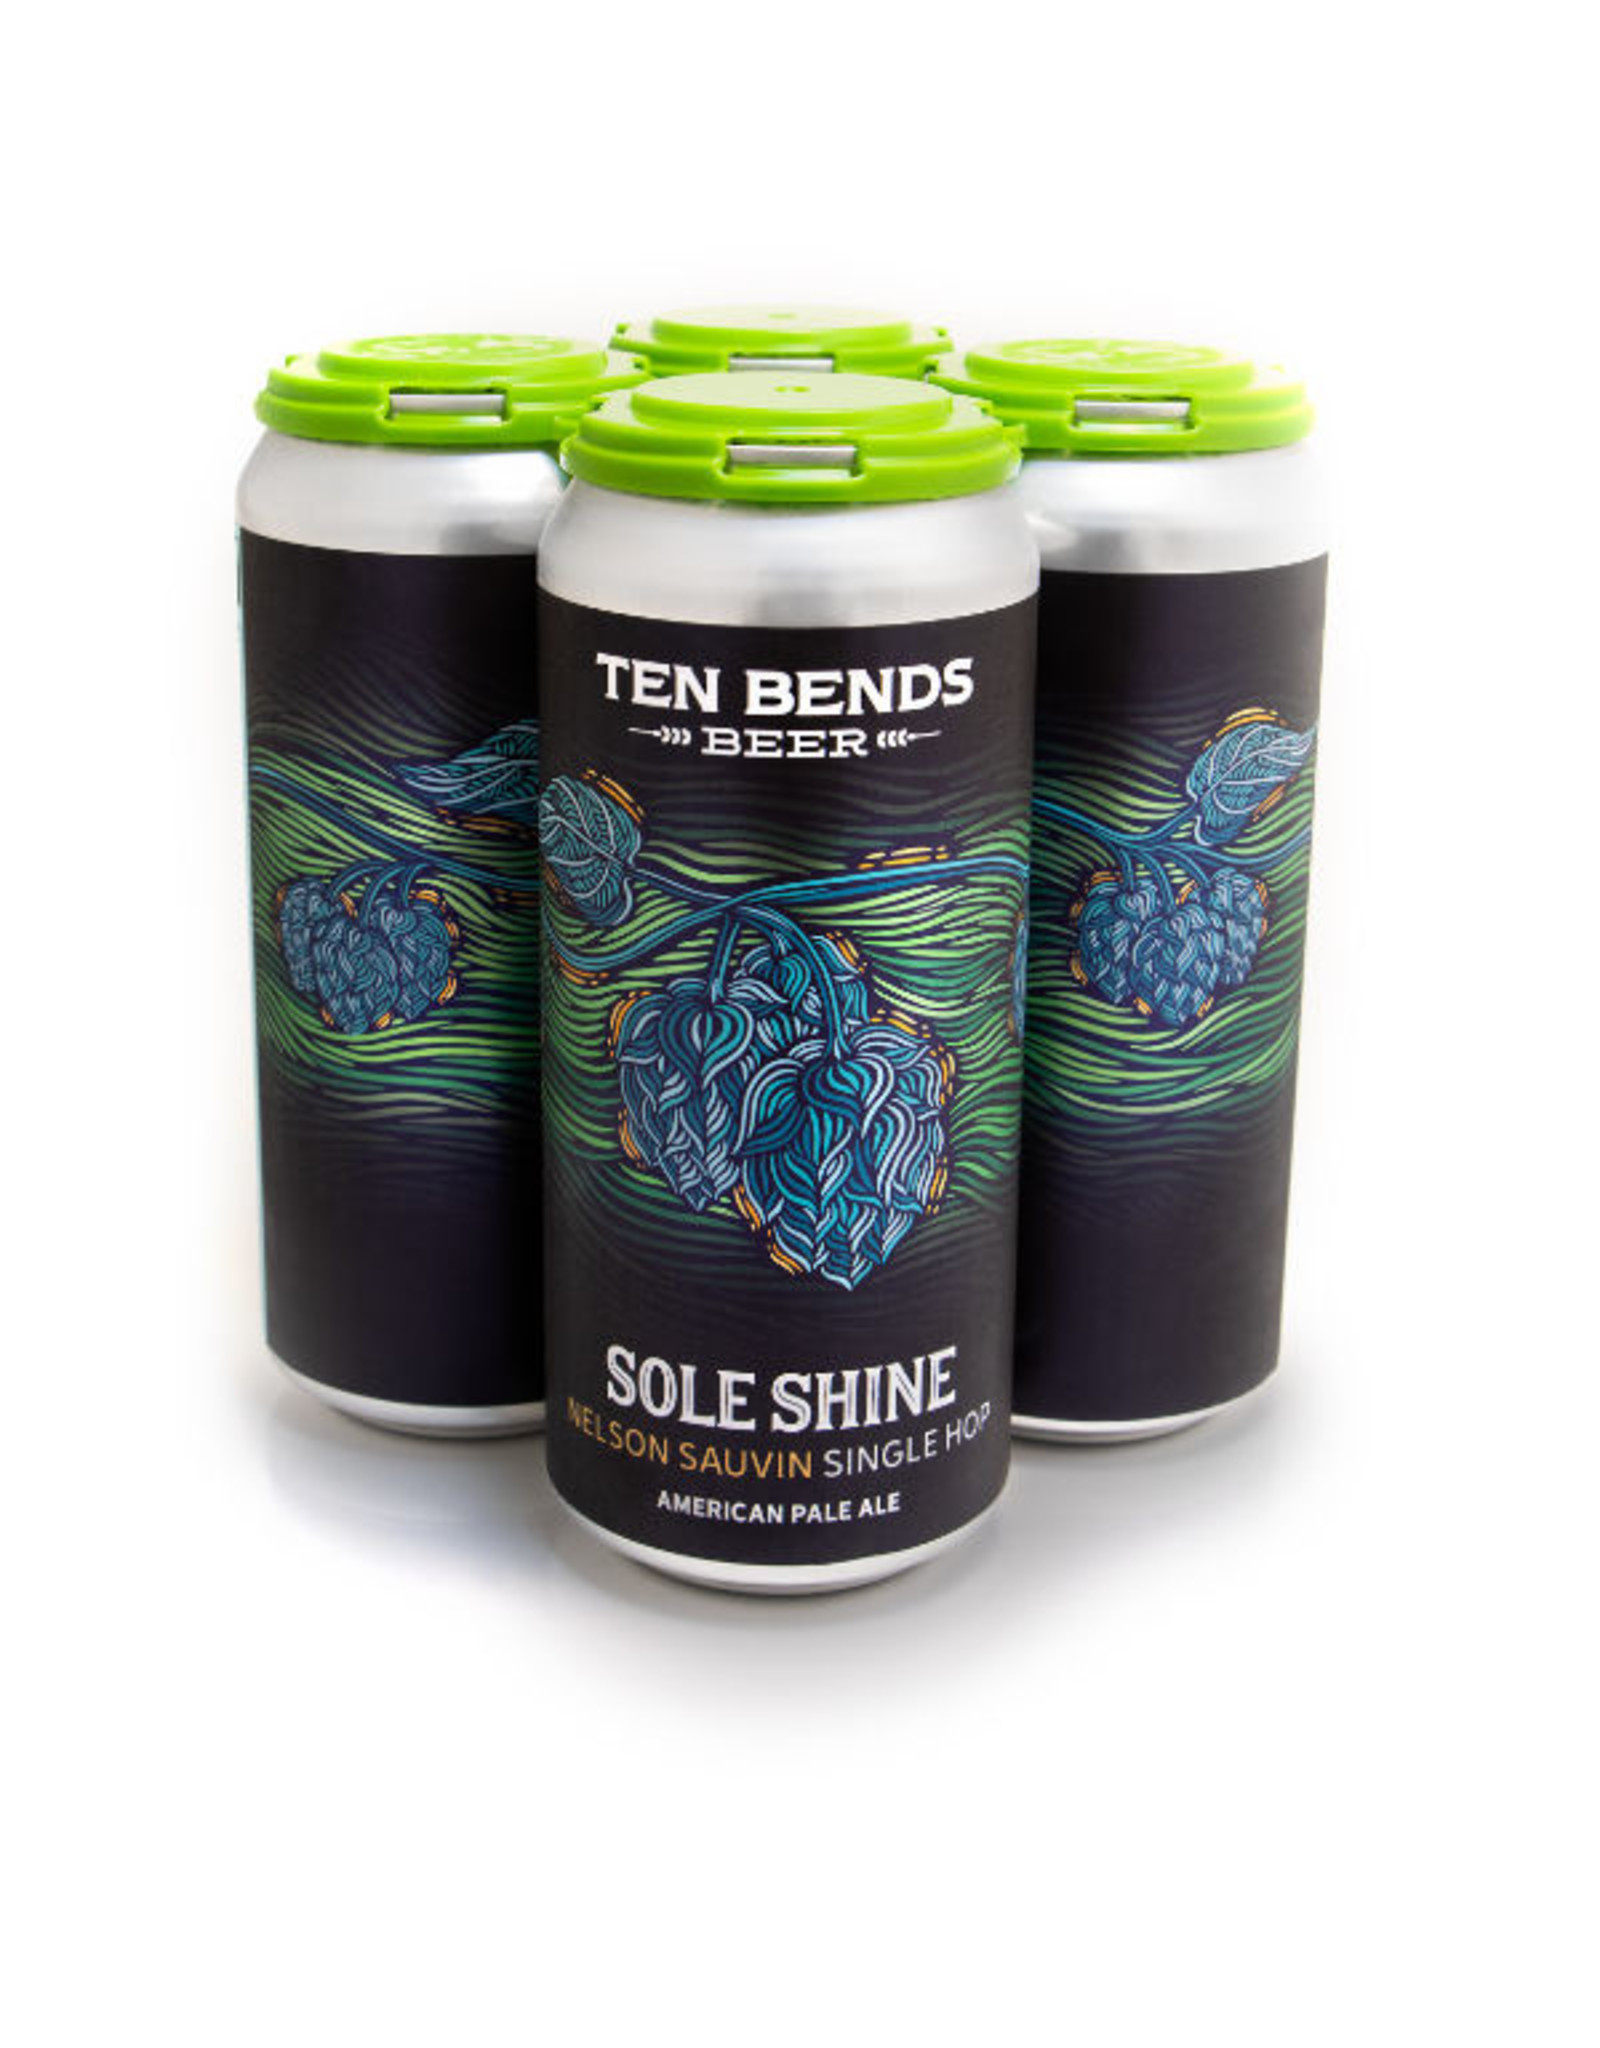 Ten Bends Sole Shine: Nelson Sauvin APA 16oz 4pk Cans